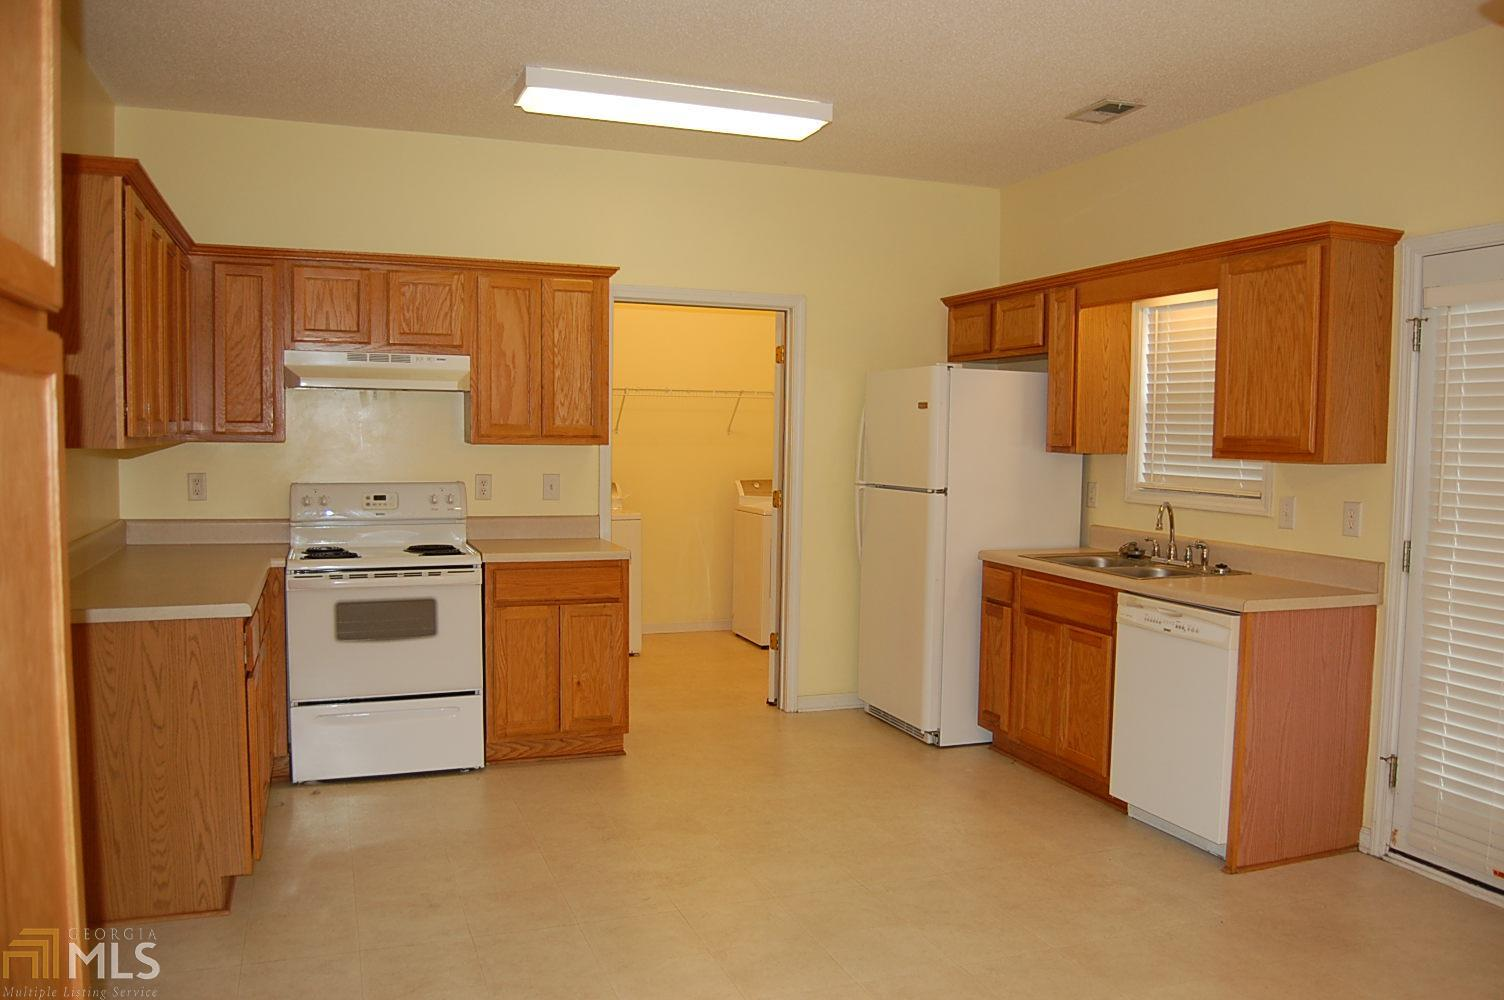 220 White Pine Lane, Temple, GA 30179